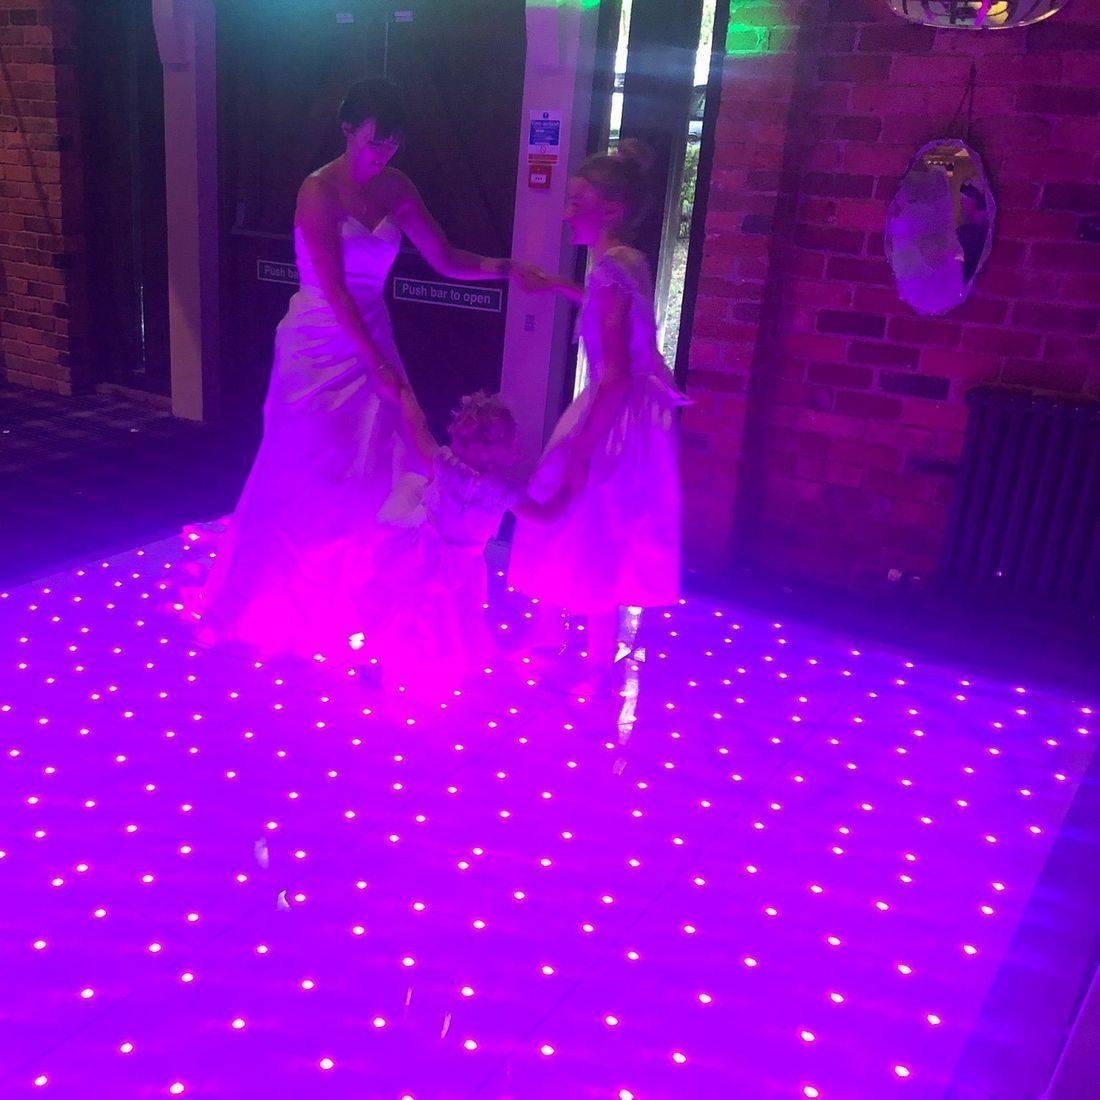 The Bell at Belbroughton #Worcesterhsire #wedding #dj #weddingentertainment #barn #barnwedding #leddancefloor